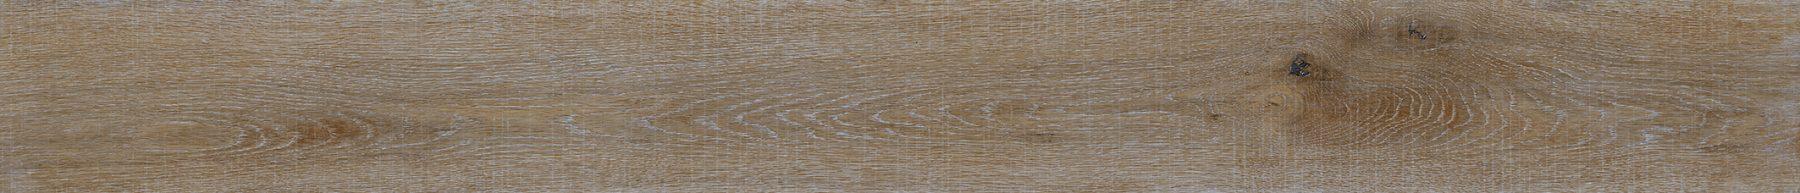 Porcelanosa Devon Roble Anti-Slip 19.3 x 180 cm